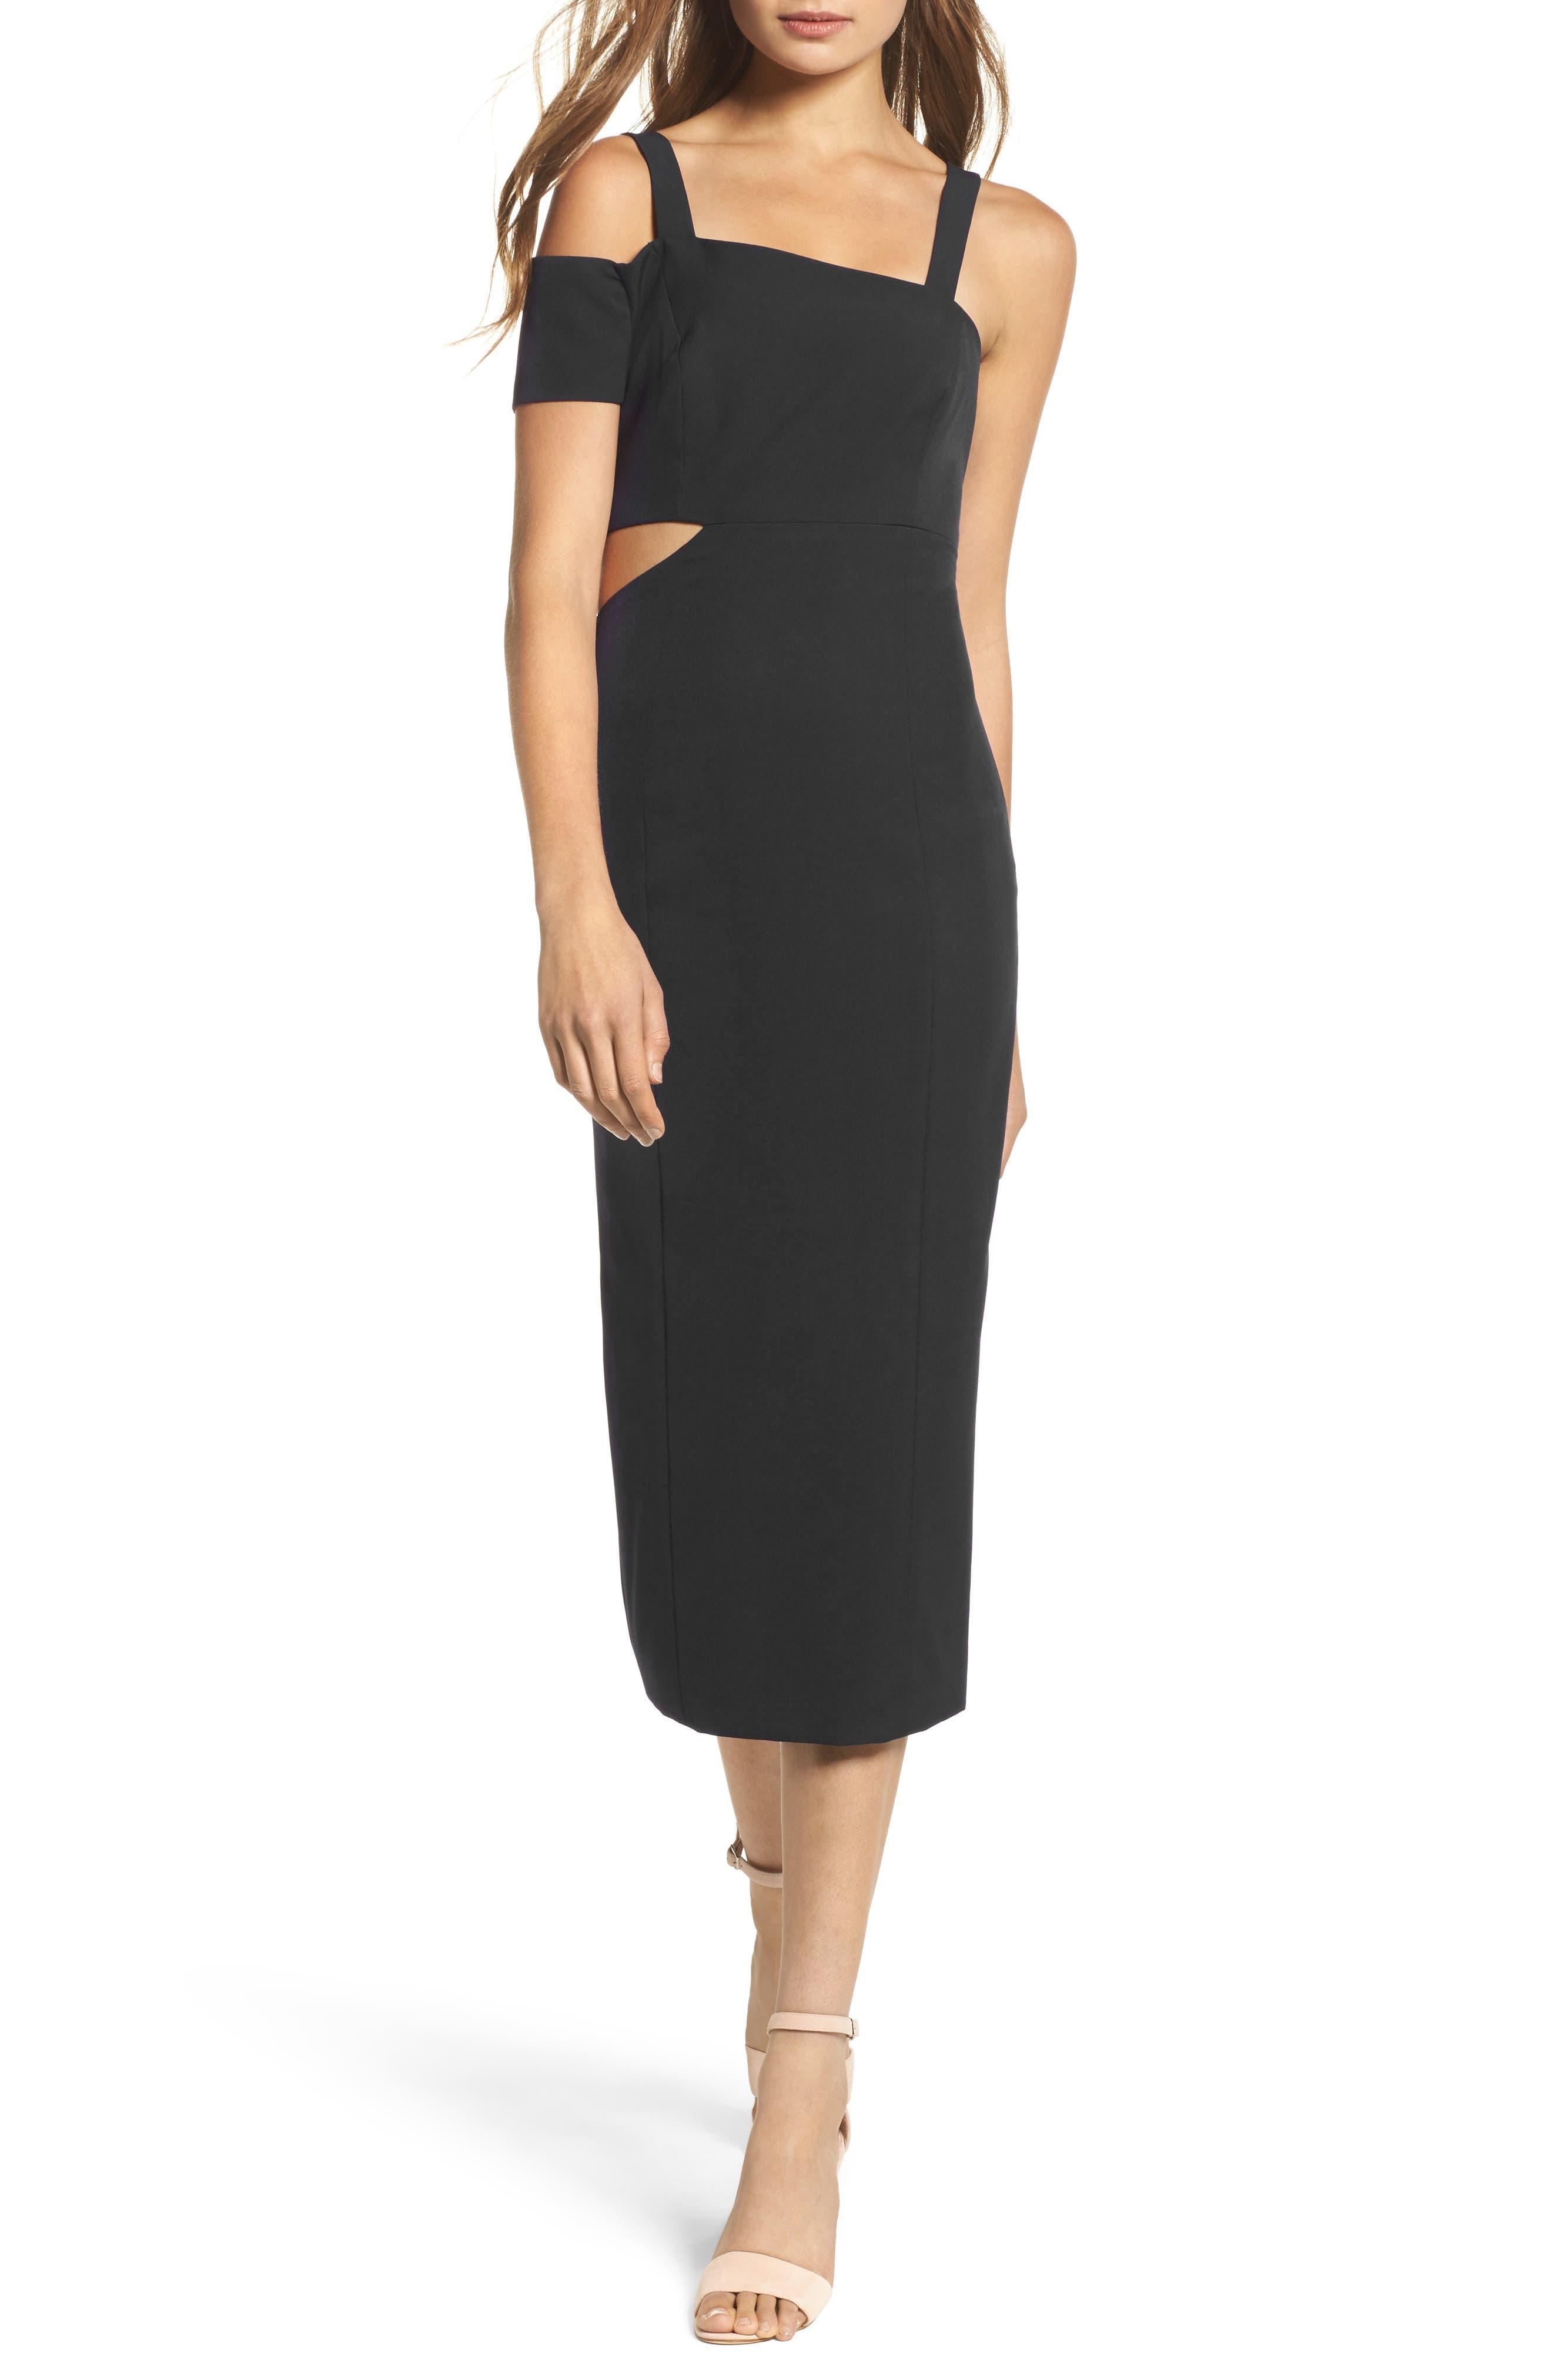 Marquette Cutout Sheath Dress,                         Main,                         color, 001